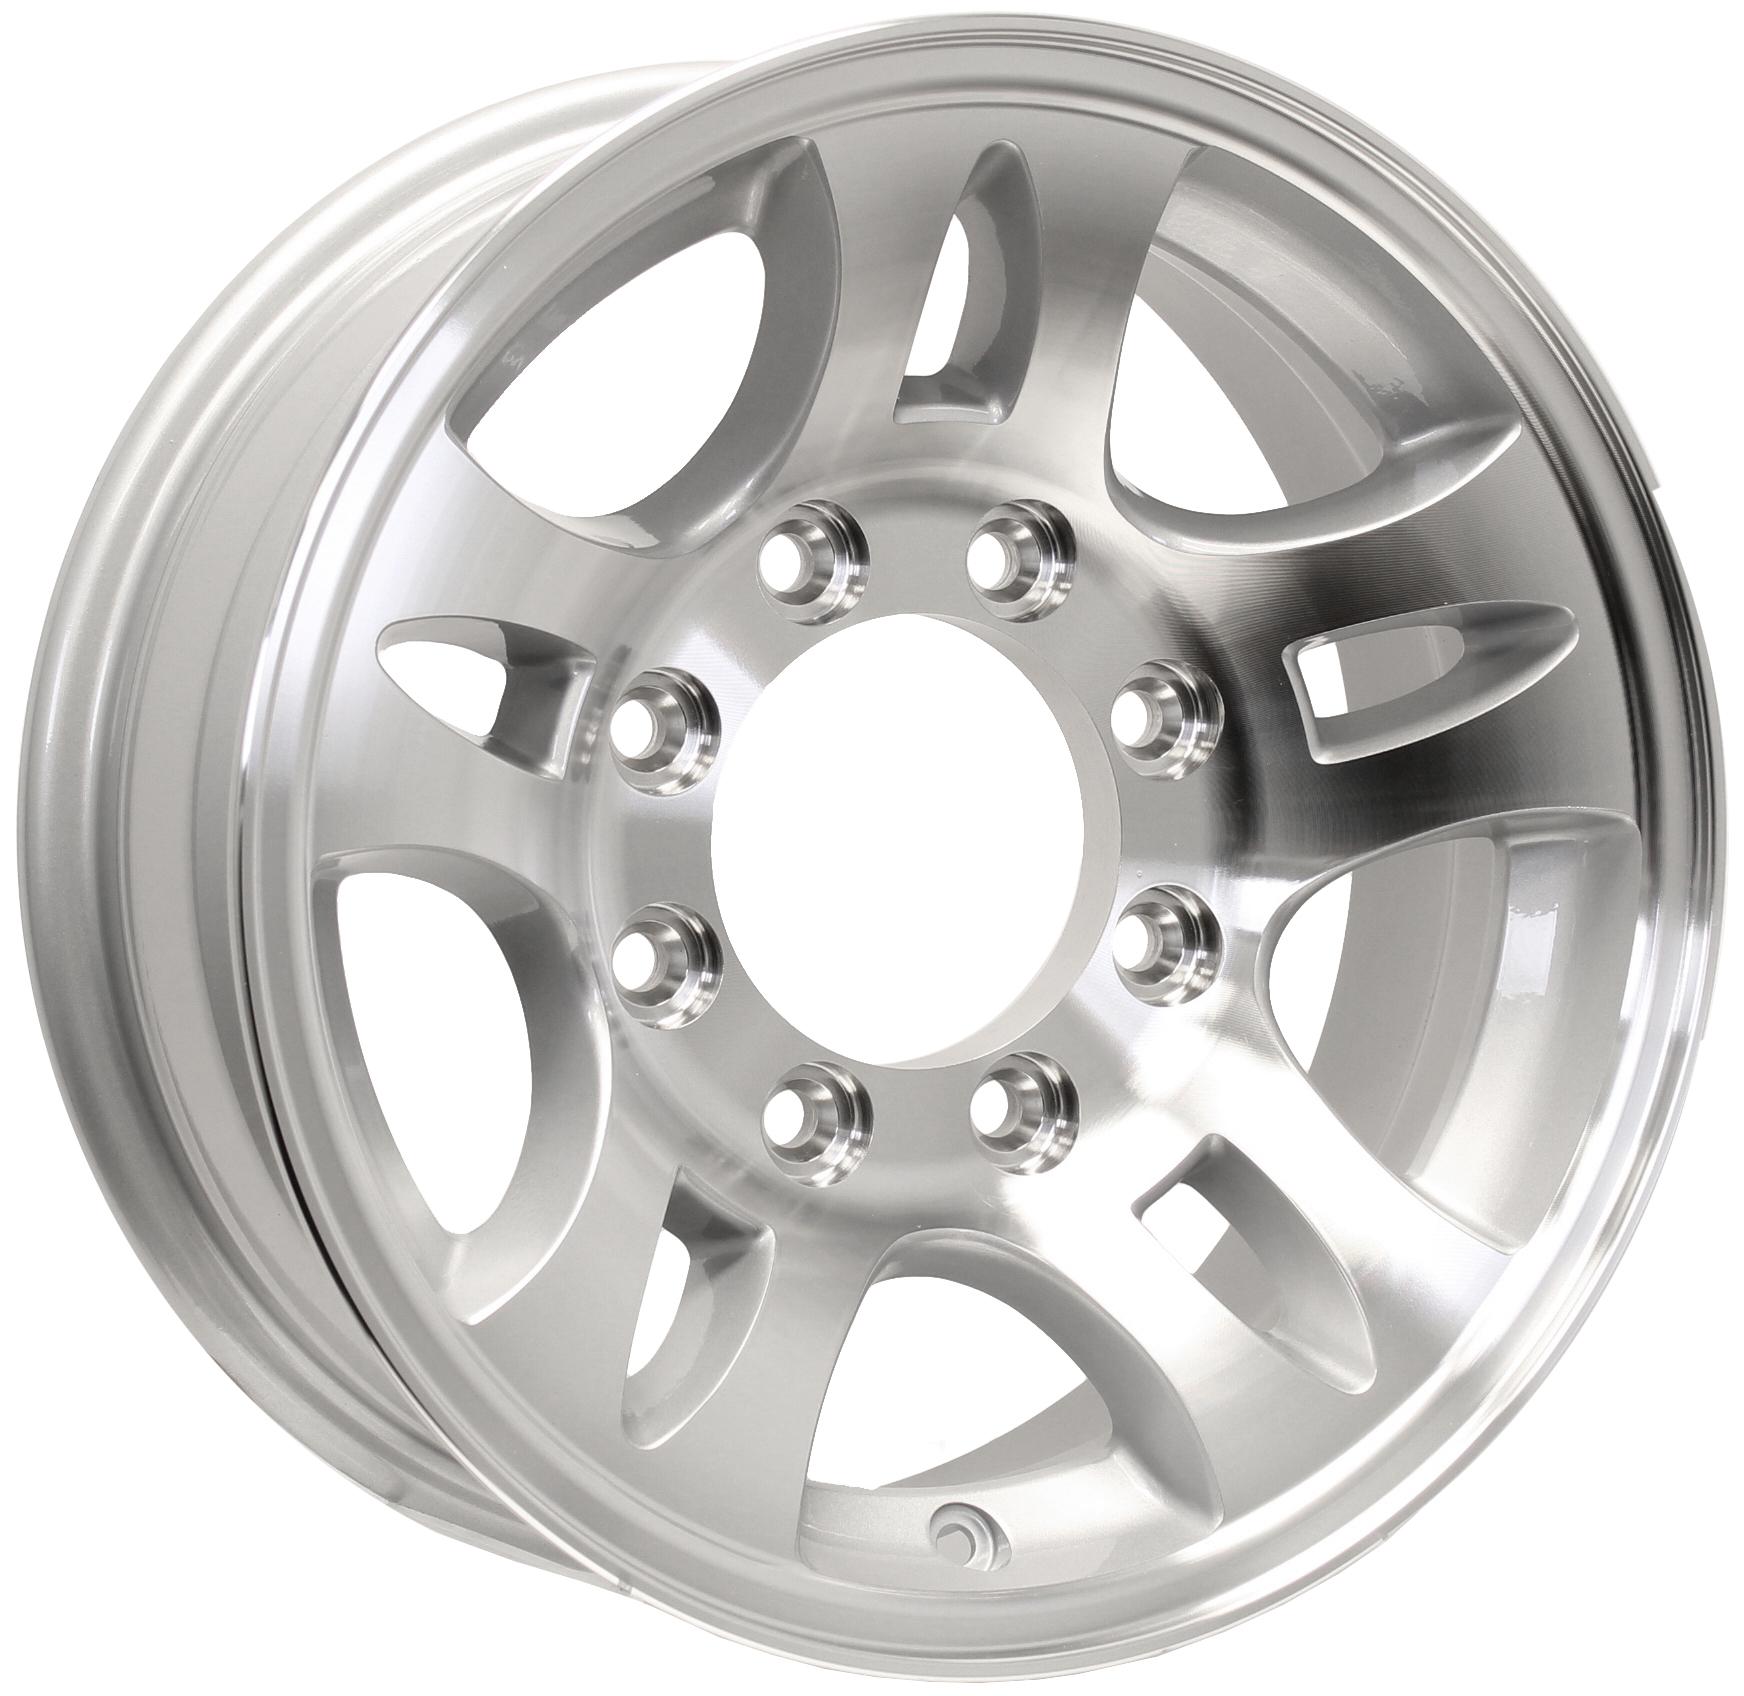 T03- 16x6; 8-Lug Silver Aluminum Trailer Wheel Image